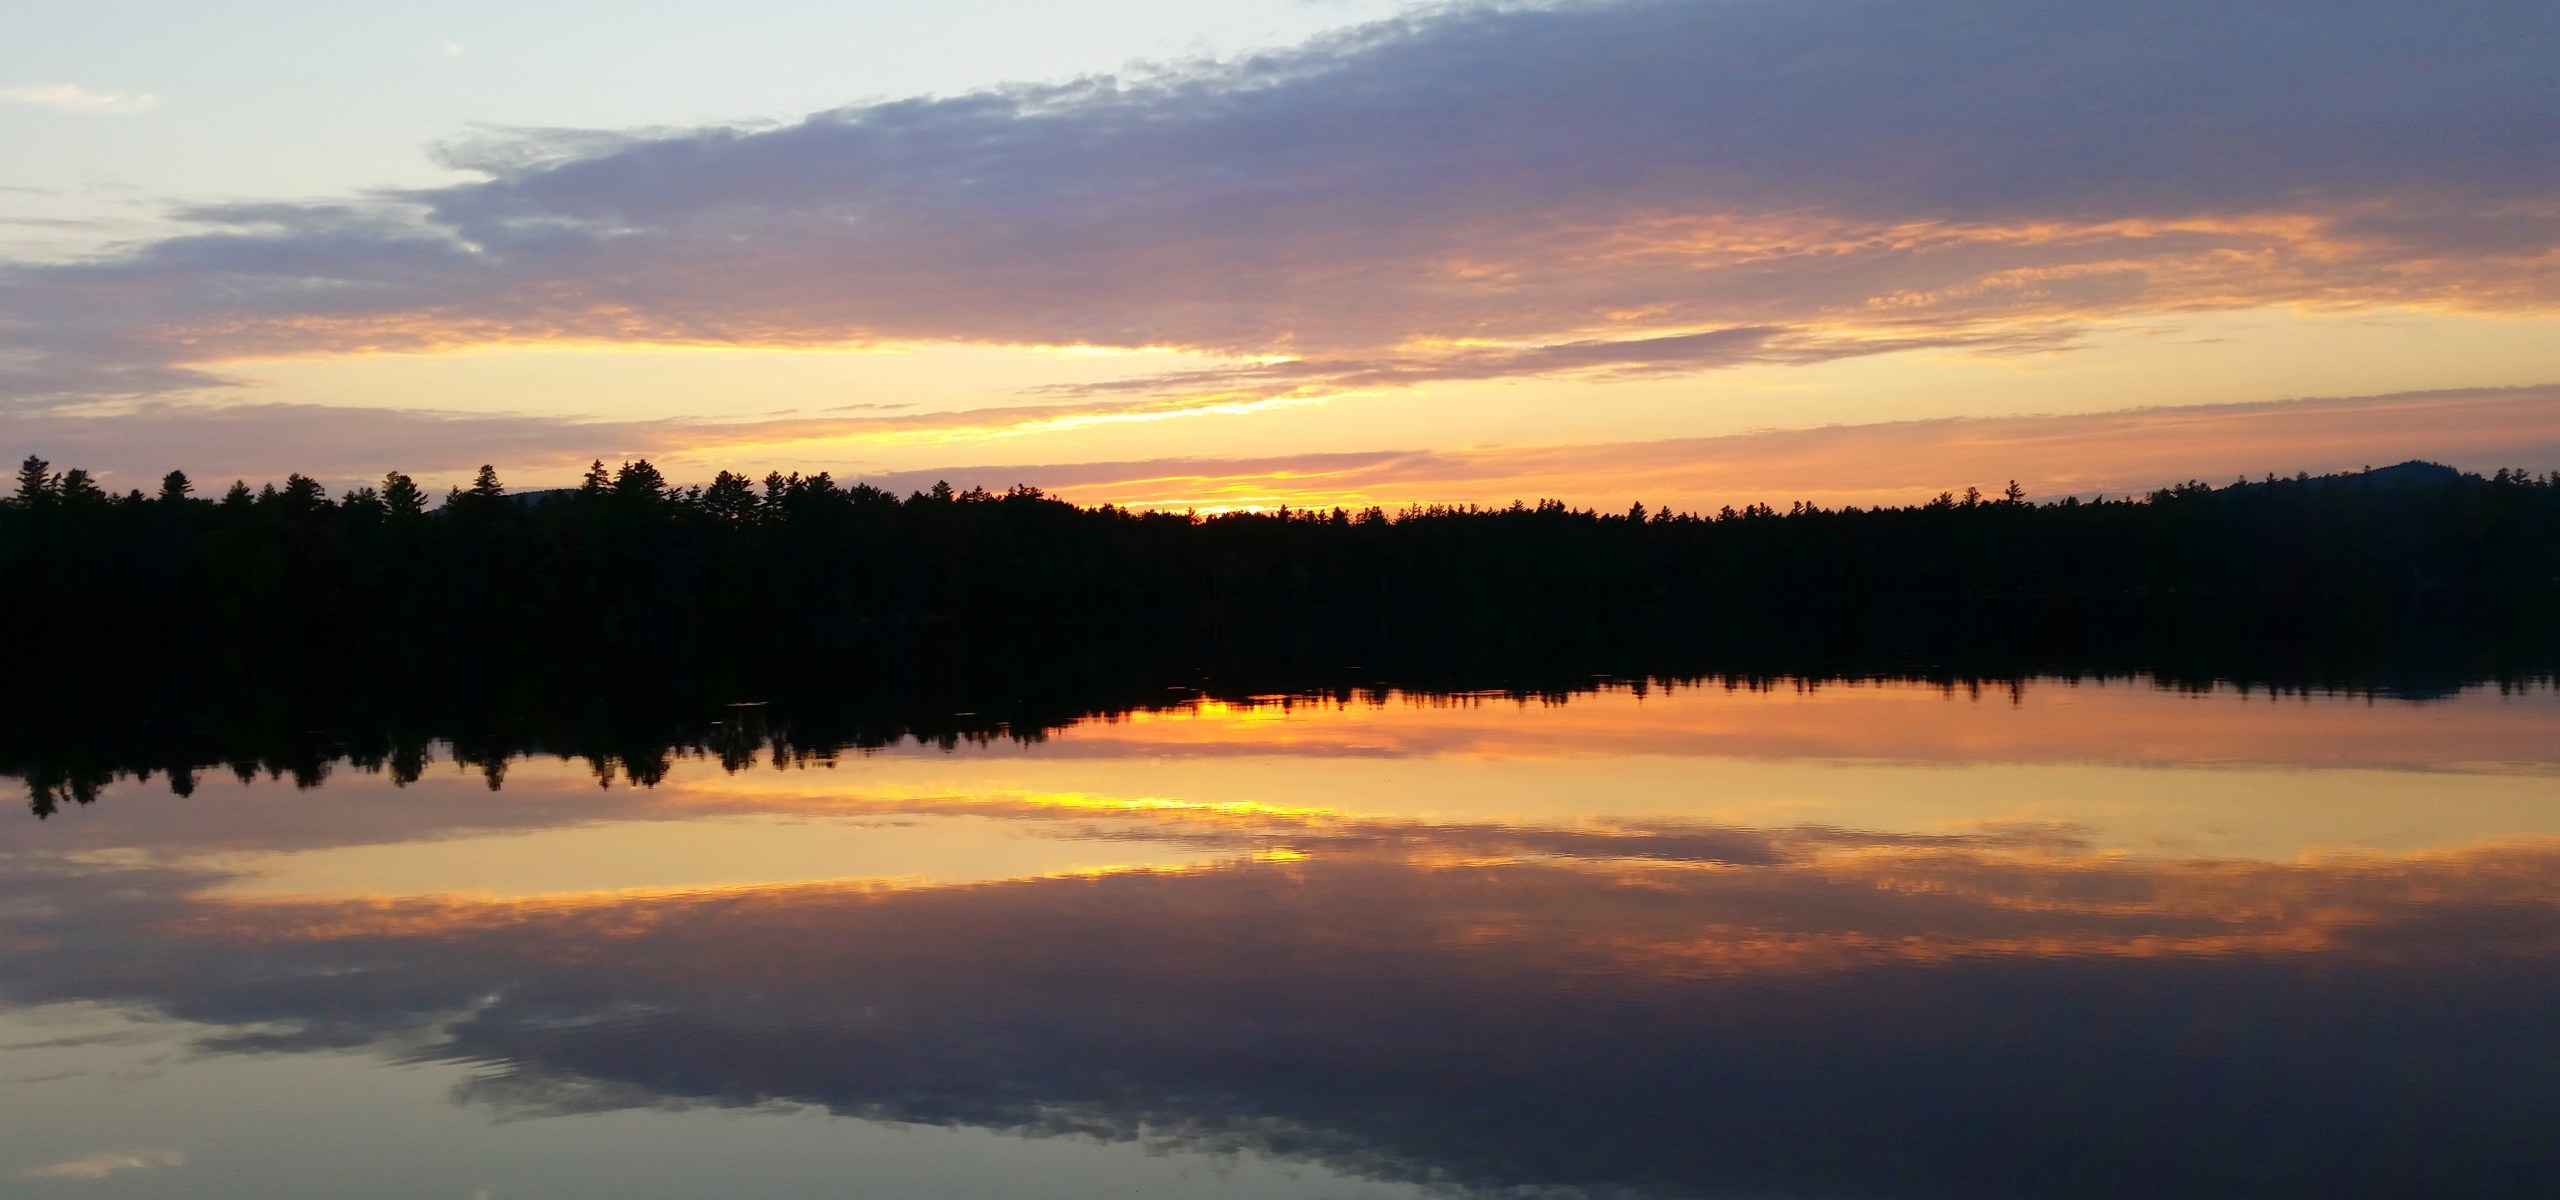 Sunset on Lake in the Adirondacks